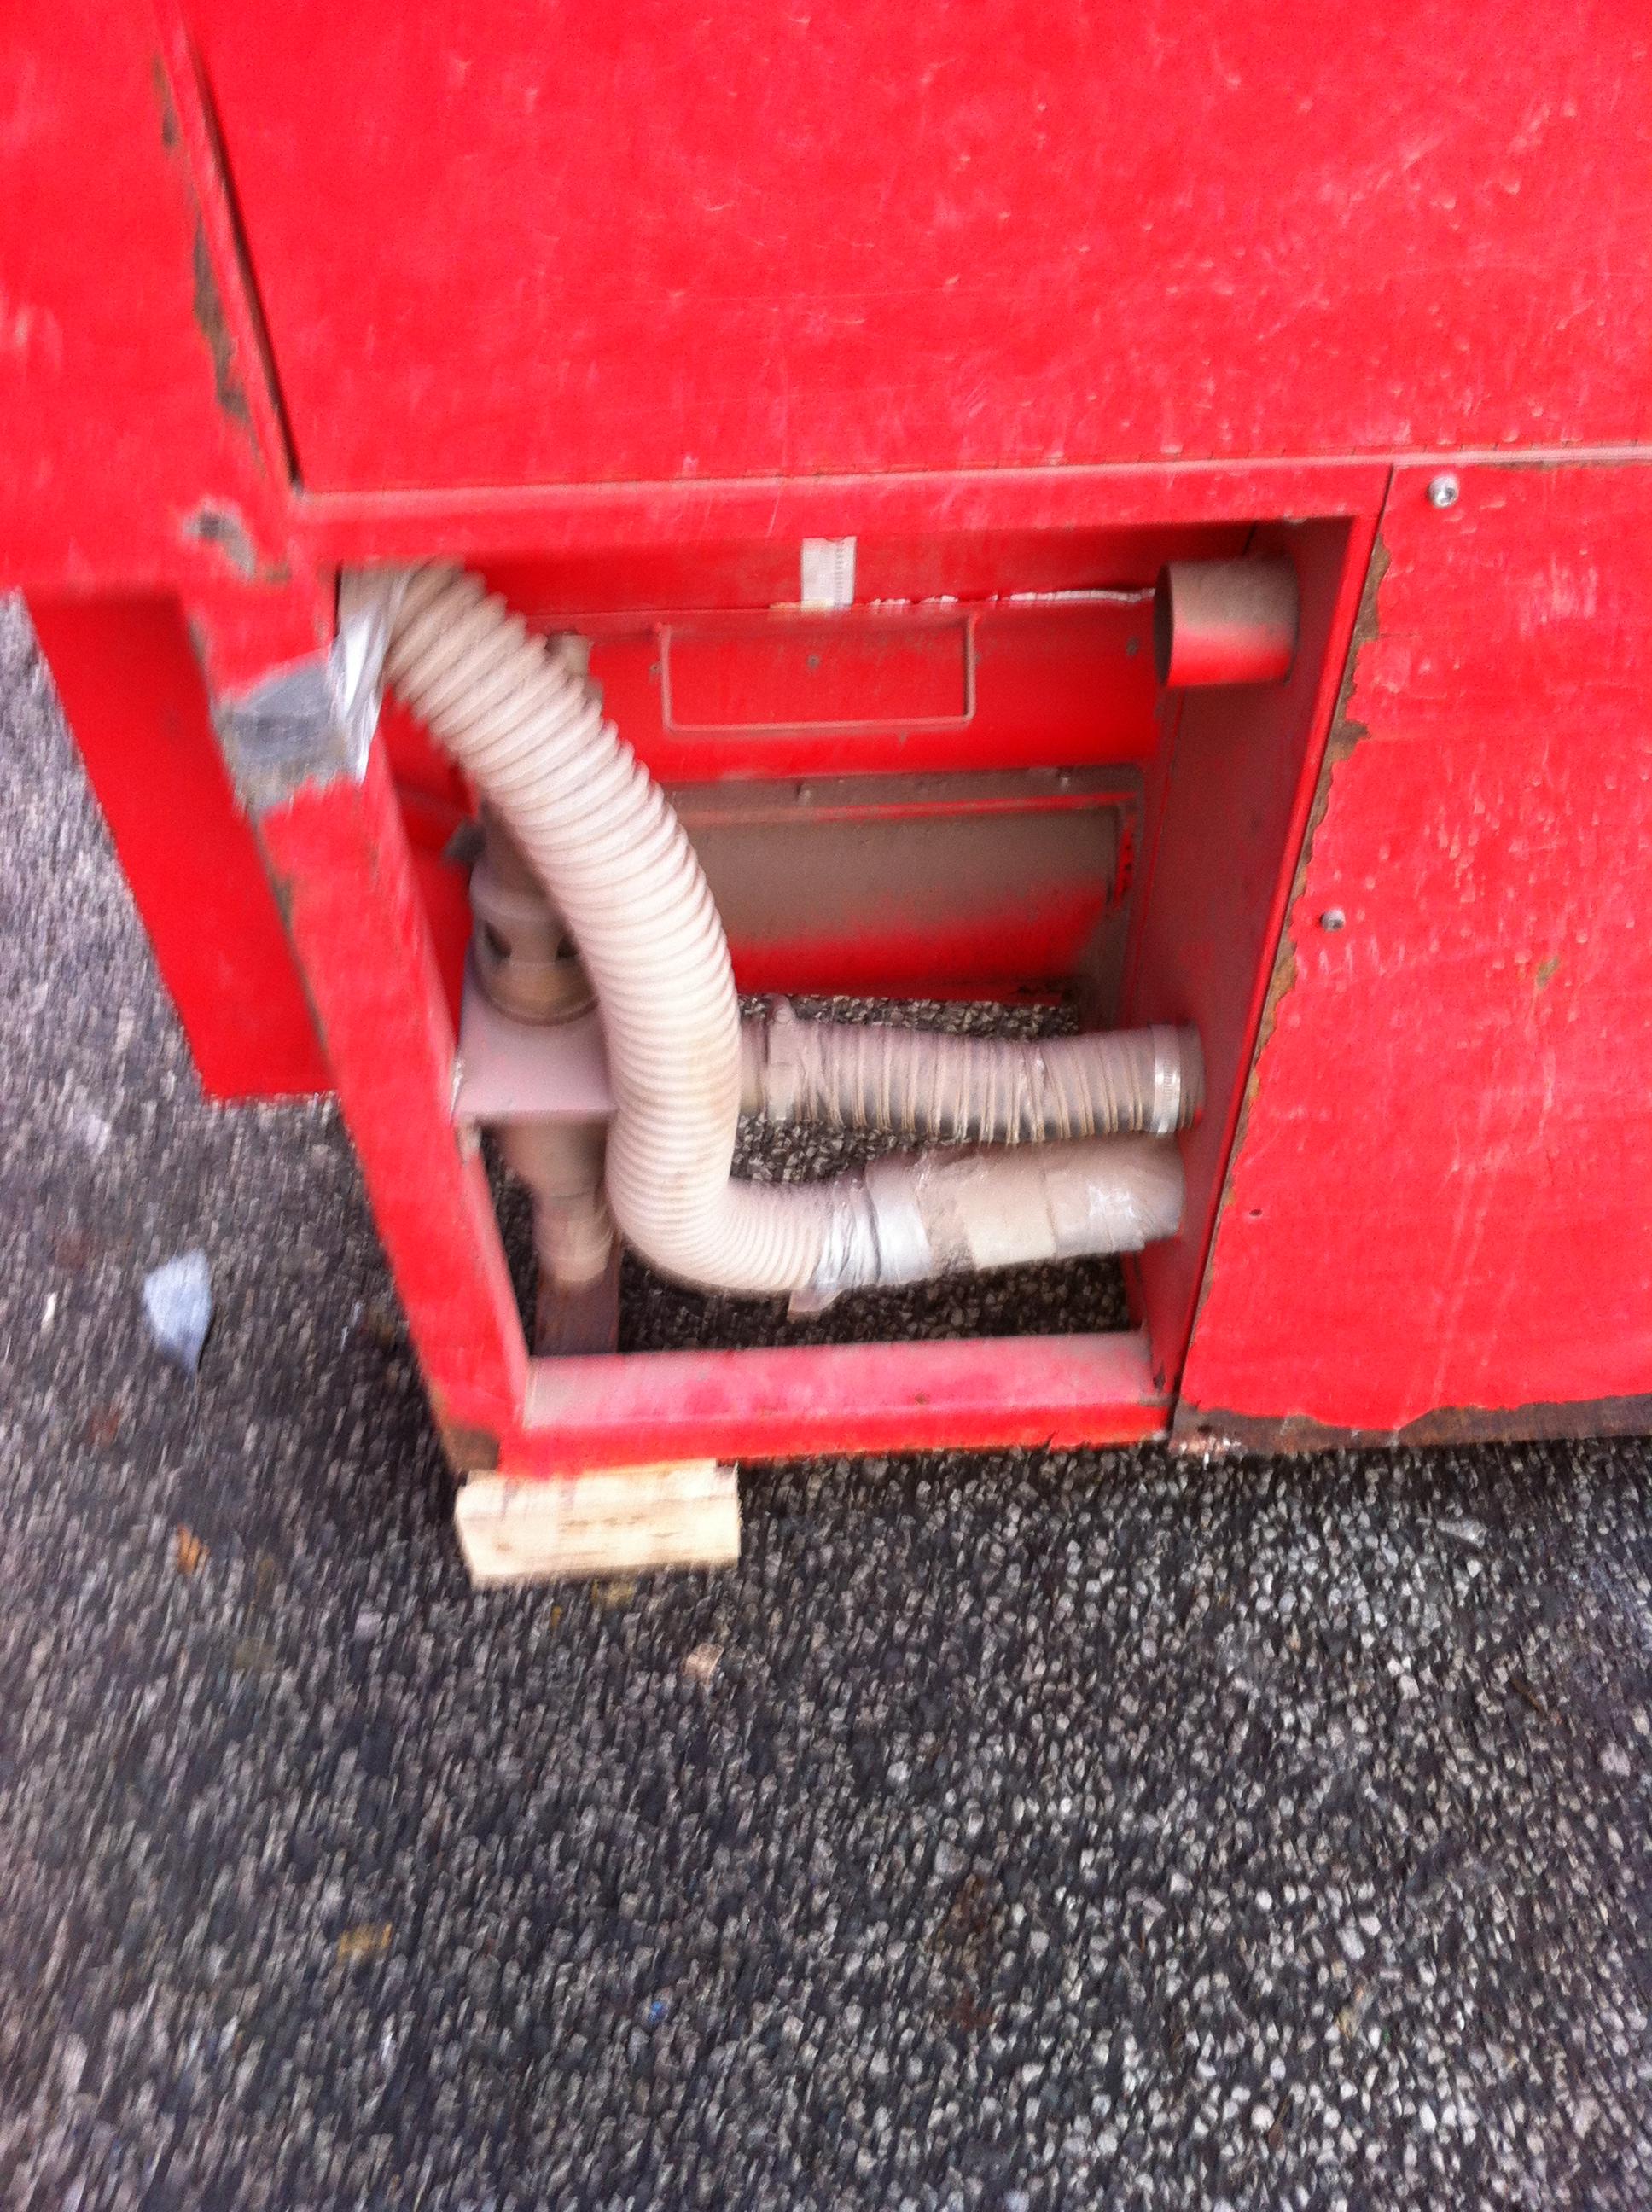 Stuart Energy Cavity Wall Insulation Machine - SE500/C249 - Image 2 of 3